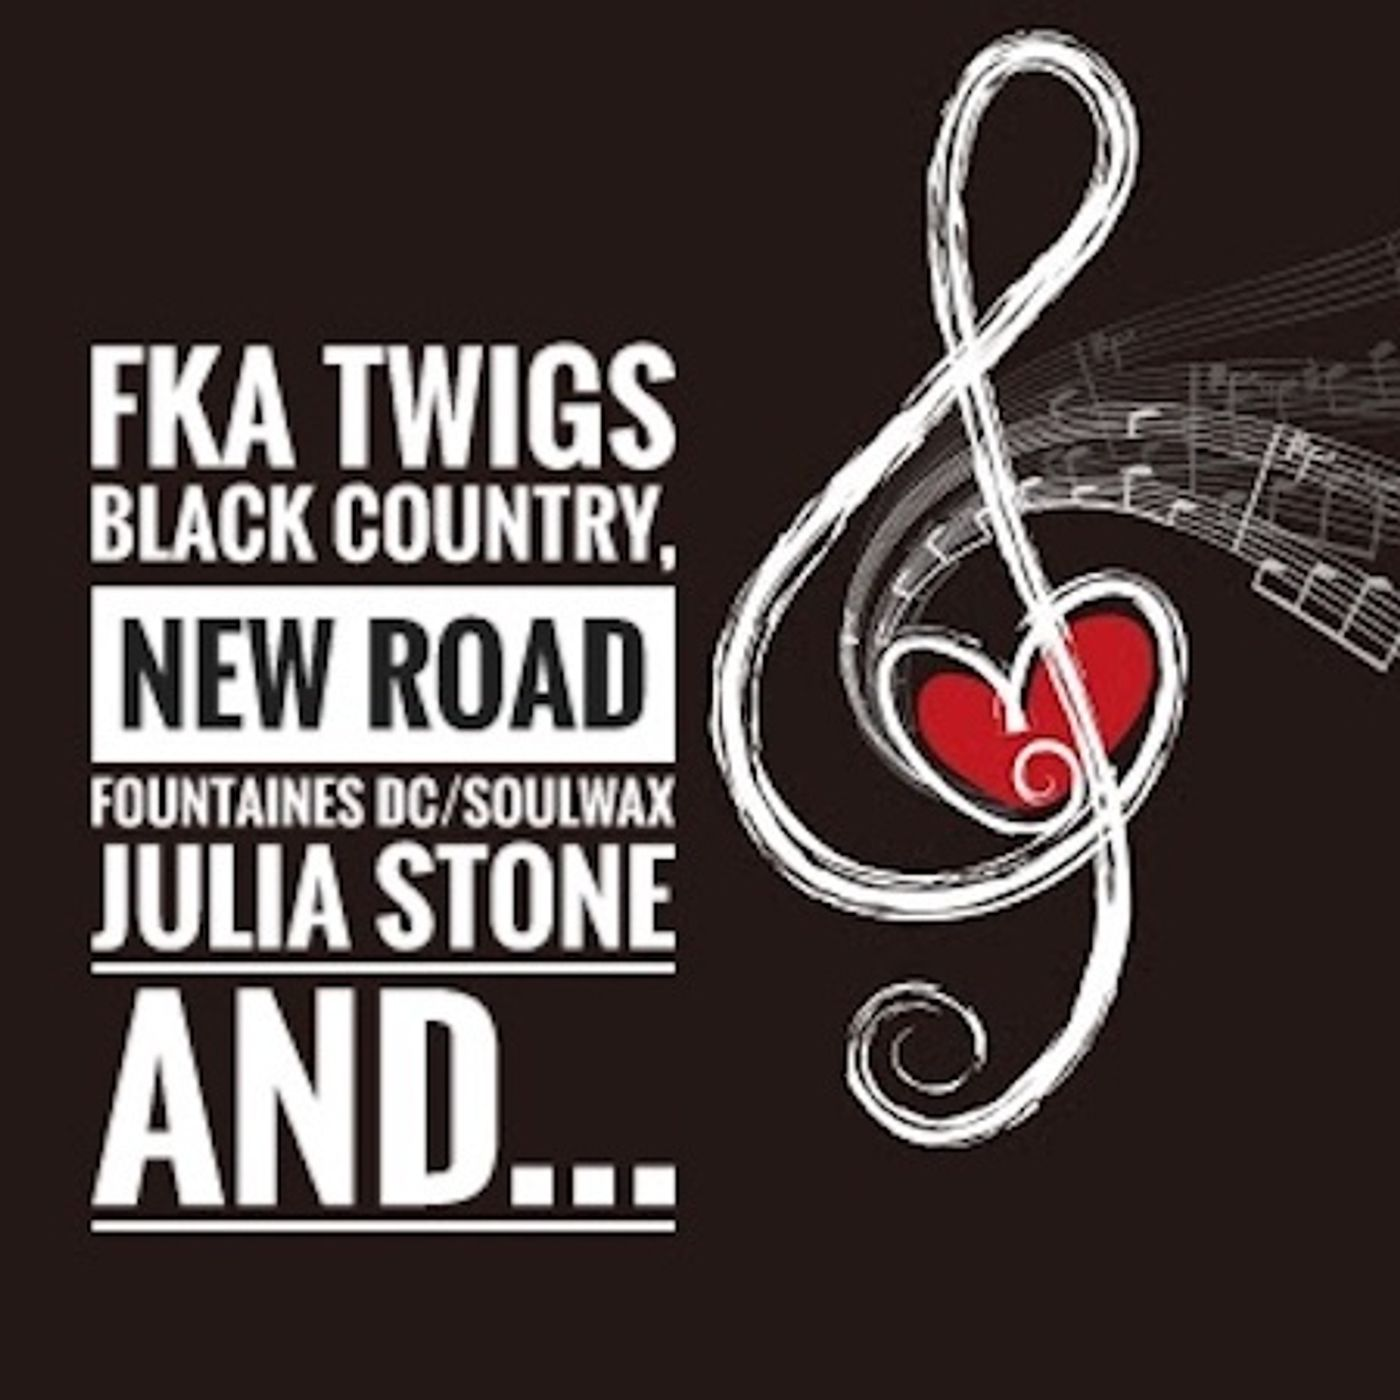 Fka Twigs, Soulwax/Fountaines Dc, Baio, Julia Stone + [Doc: Giving Voice] - Propaganda - s04e18